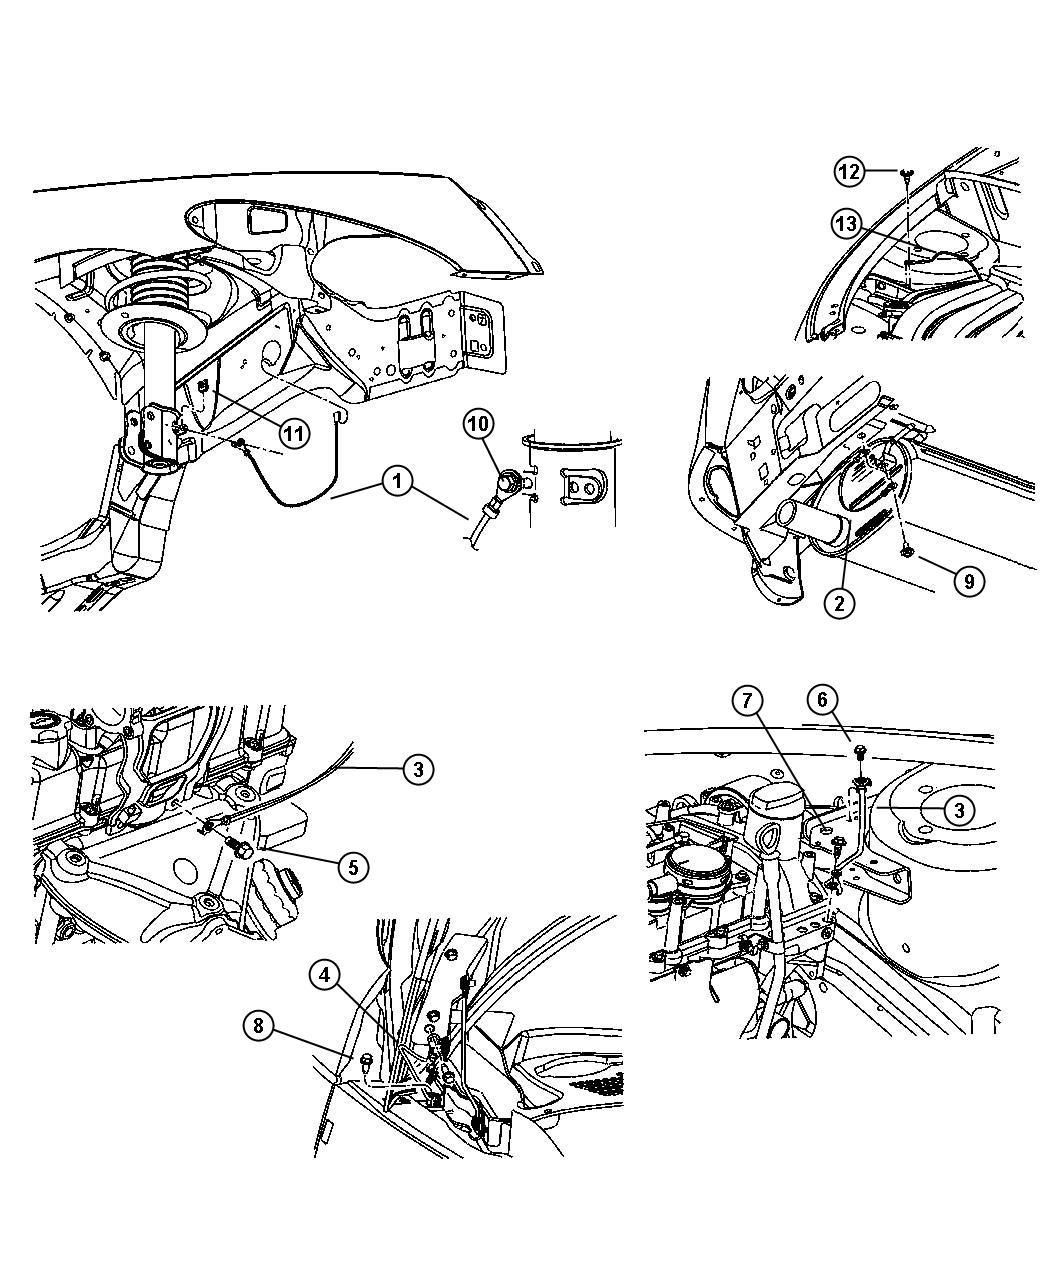 hight resolution of  2009 jaguar xf fuse box chrysler pt cruiser strap ground engine to body